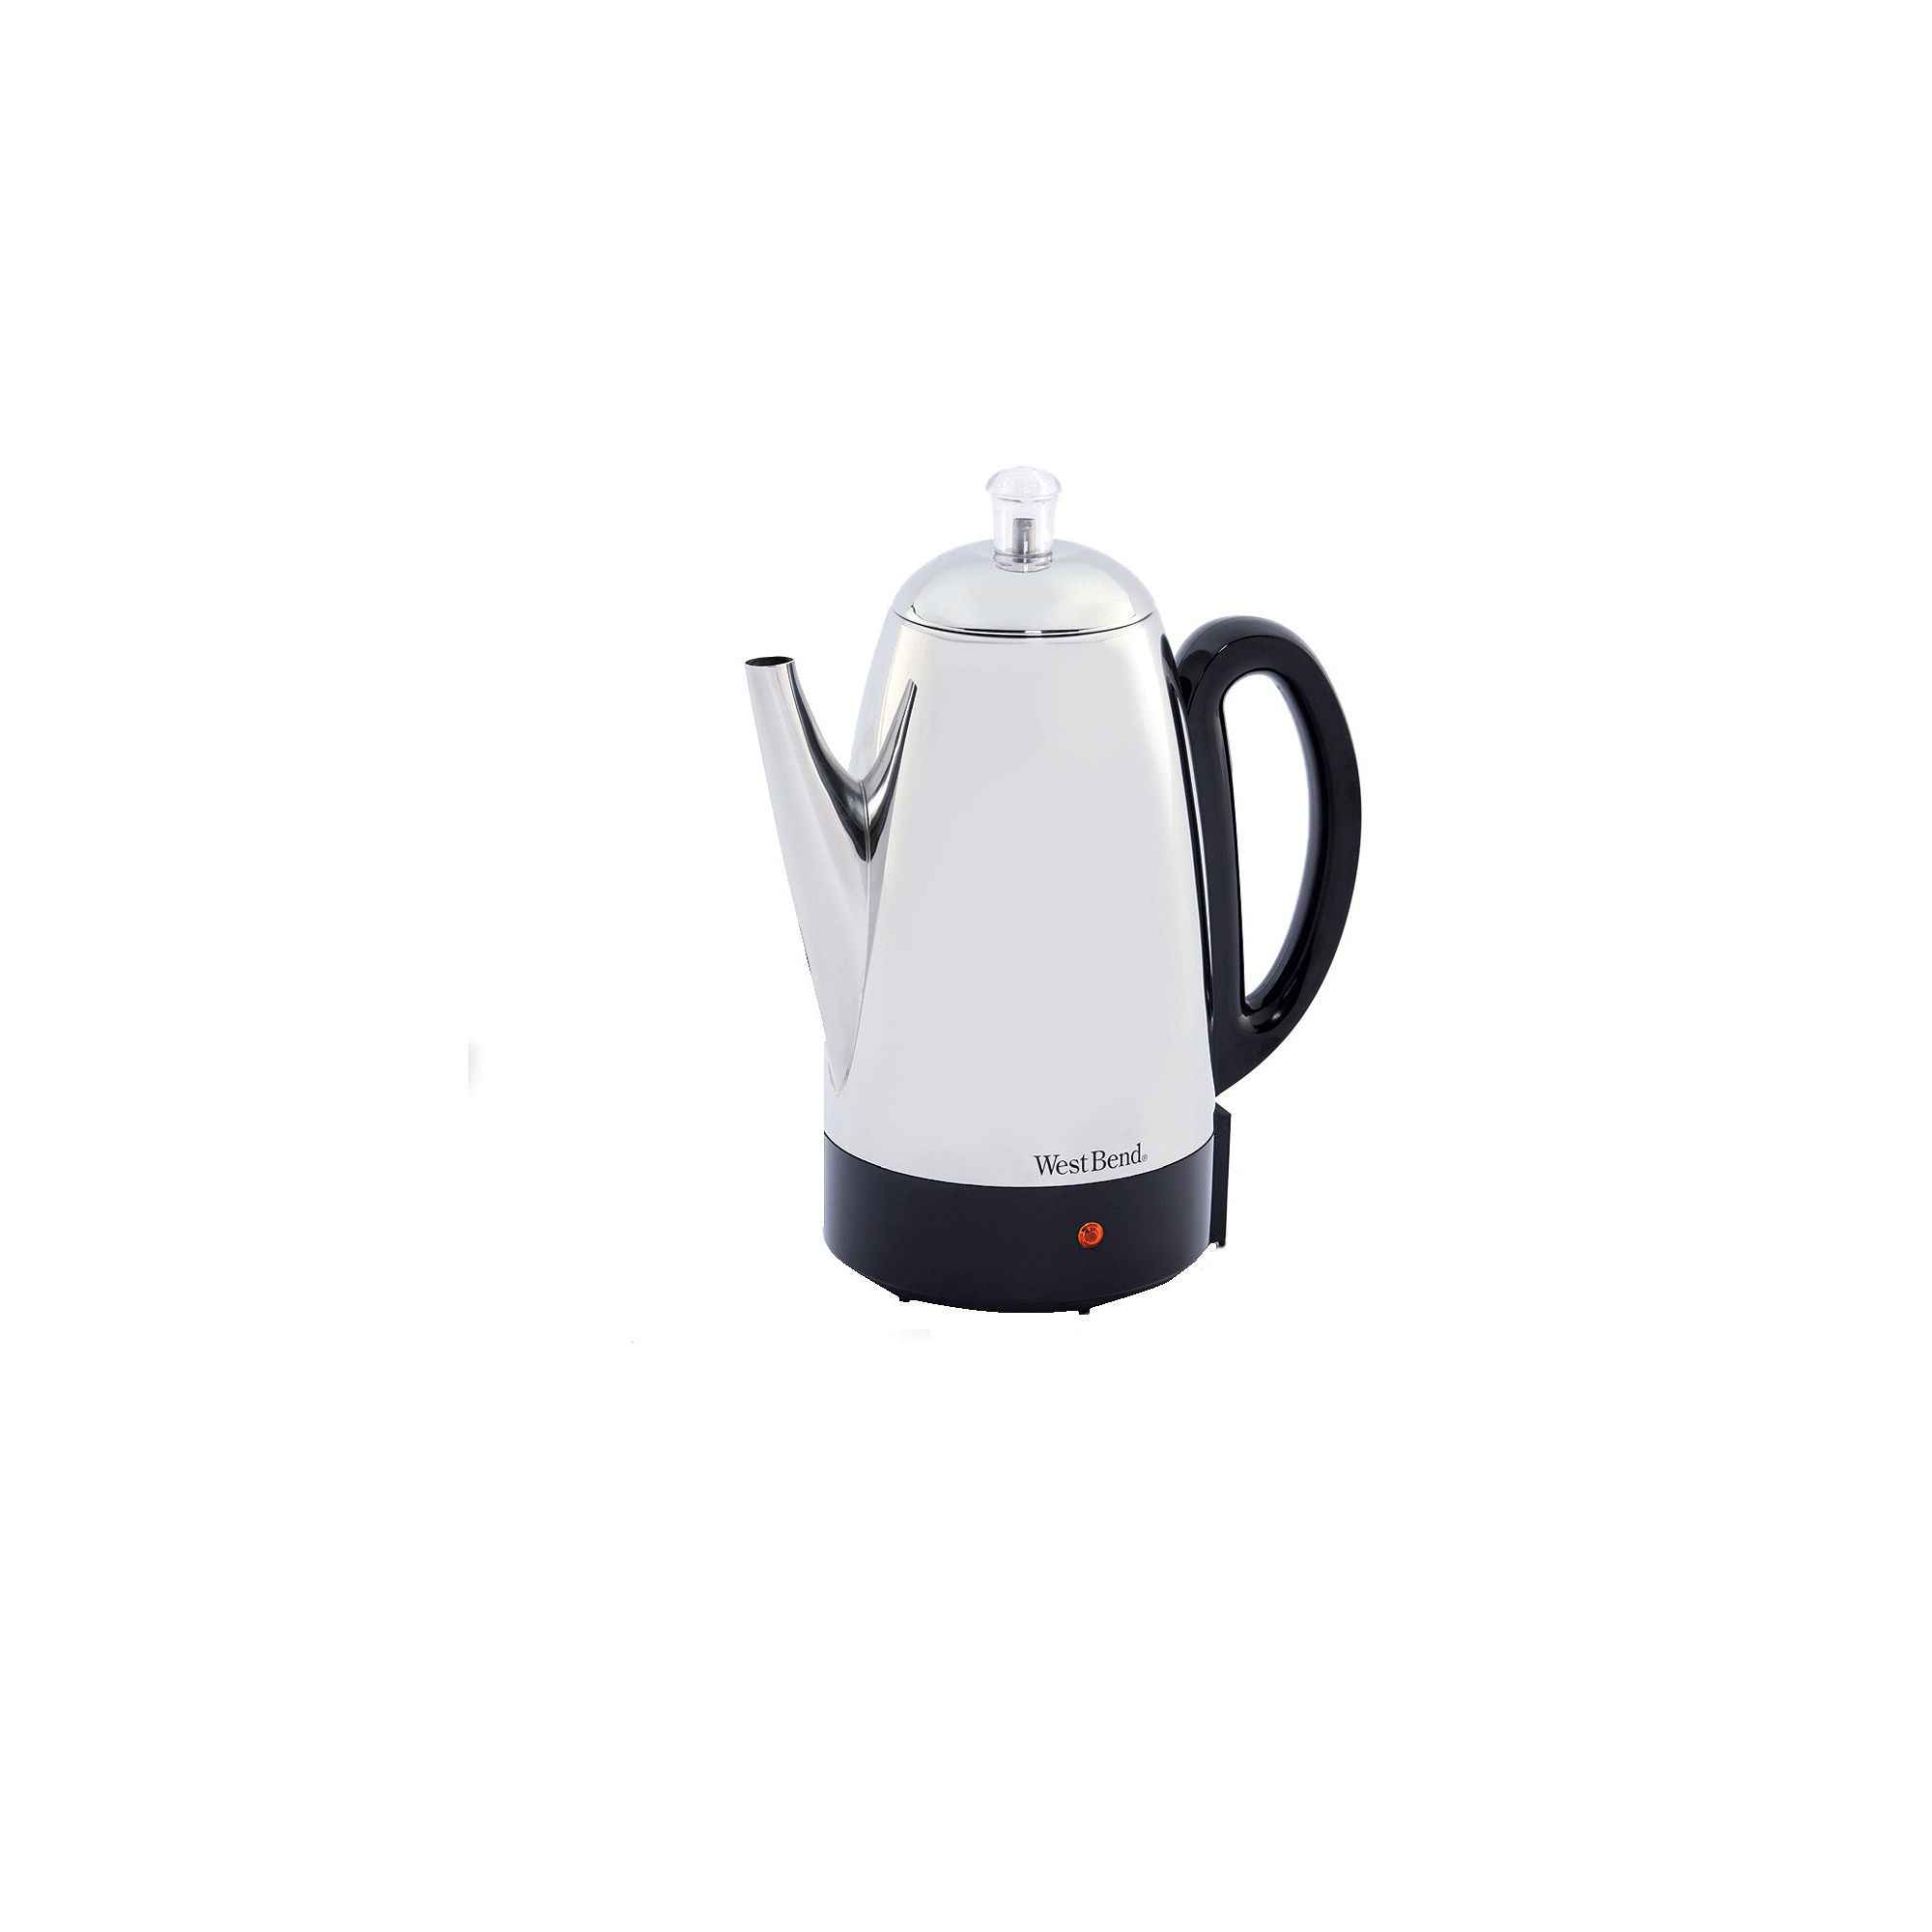 West Bend Coffee Maker